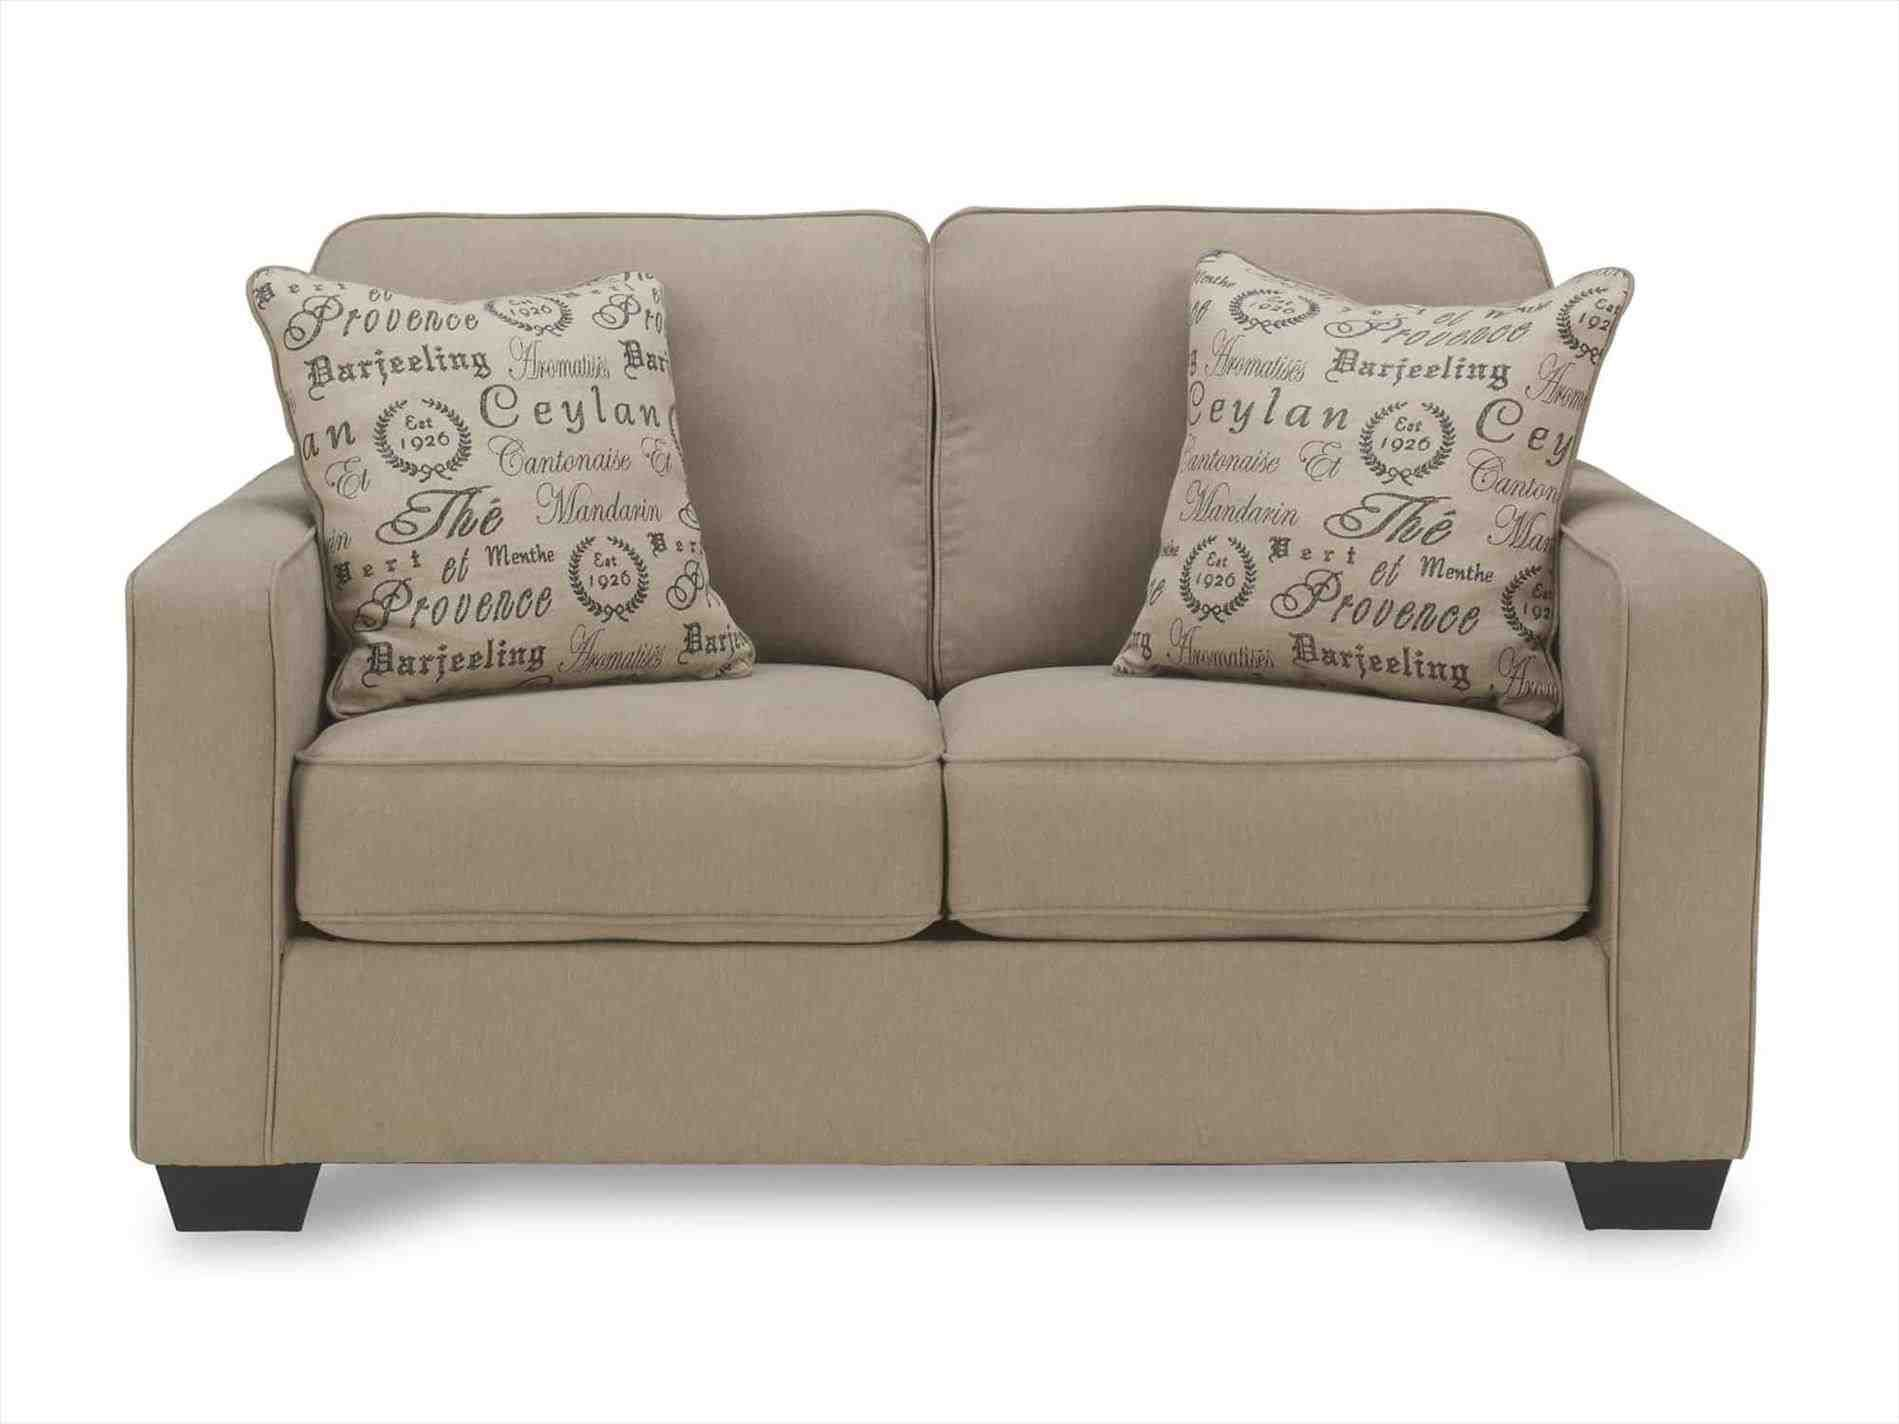 Sensational Cheap Couches Wellington Wellington Sofa Full Images Of Cjindustries Chair Design For Home Cjindustriesco